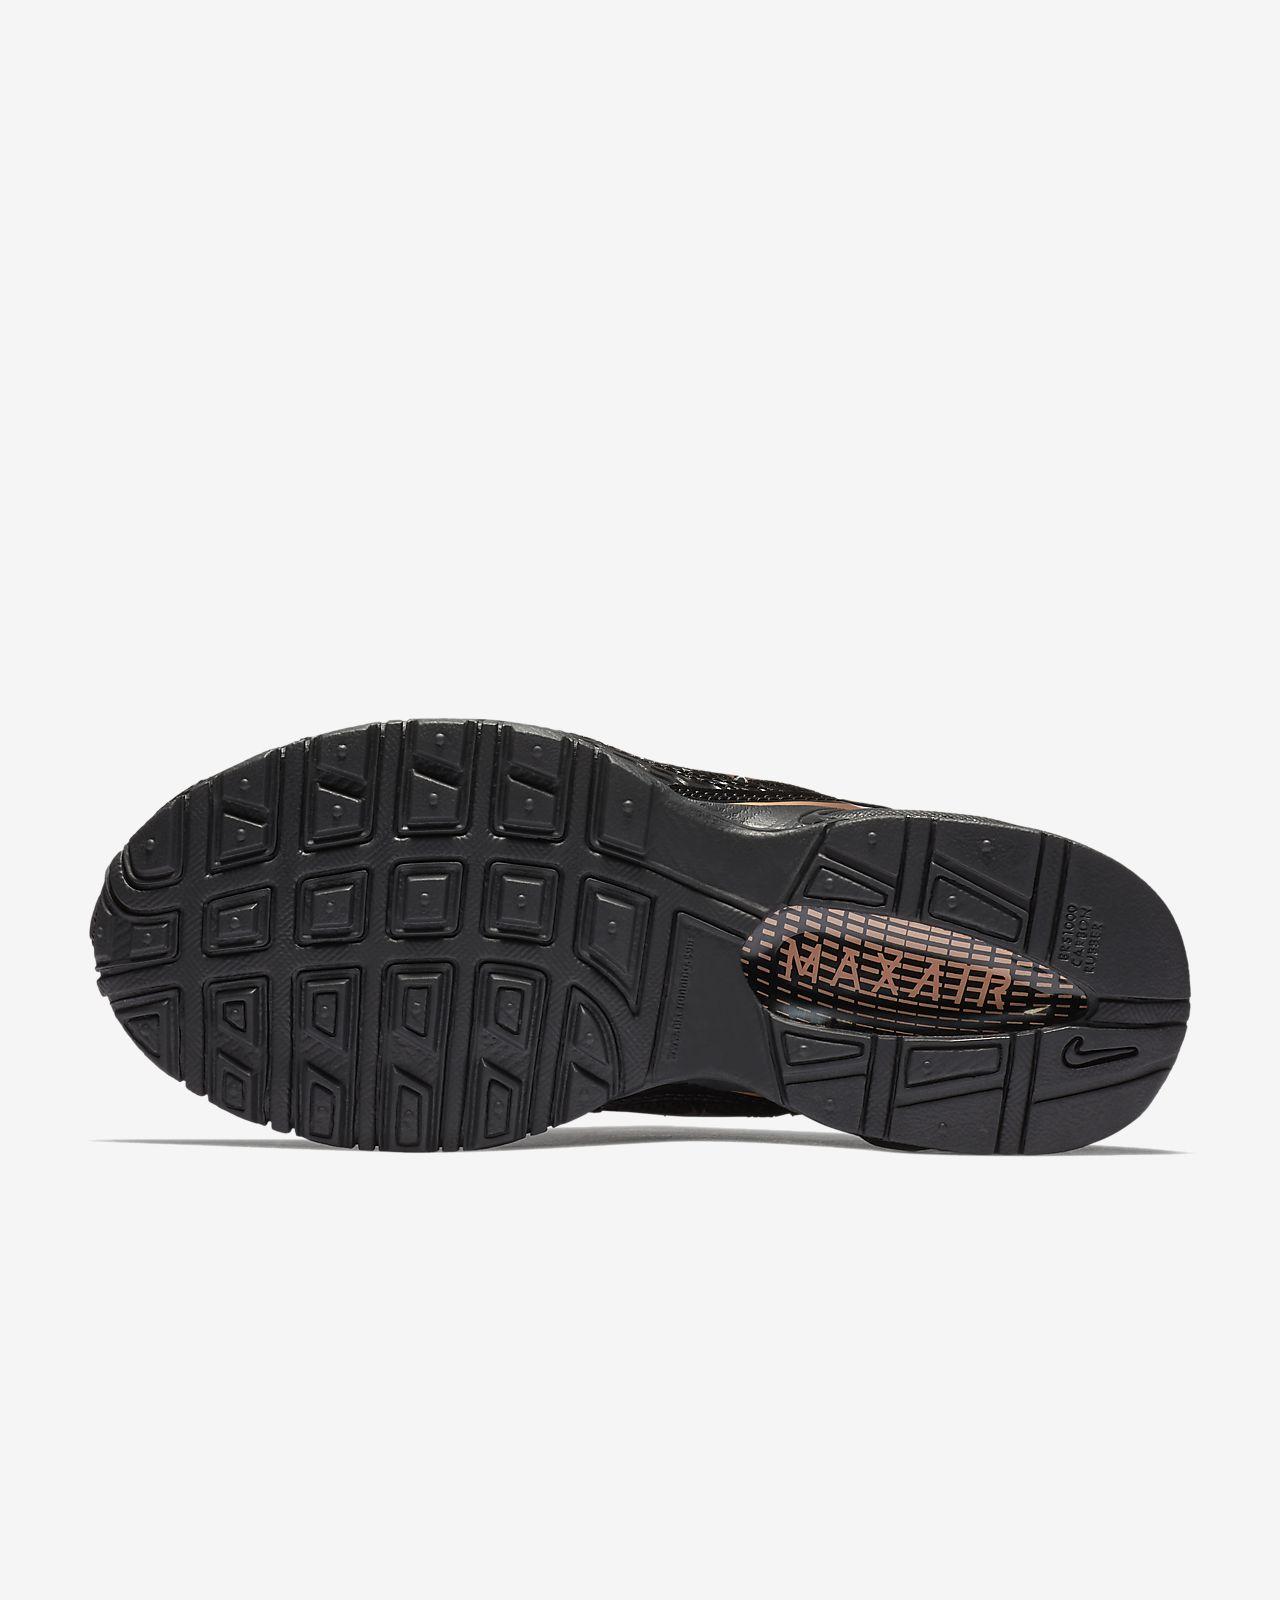 Max Torch Running 4 Women's Air Nike Shoe j4R35AL